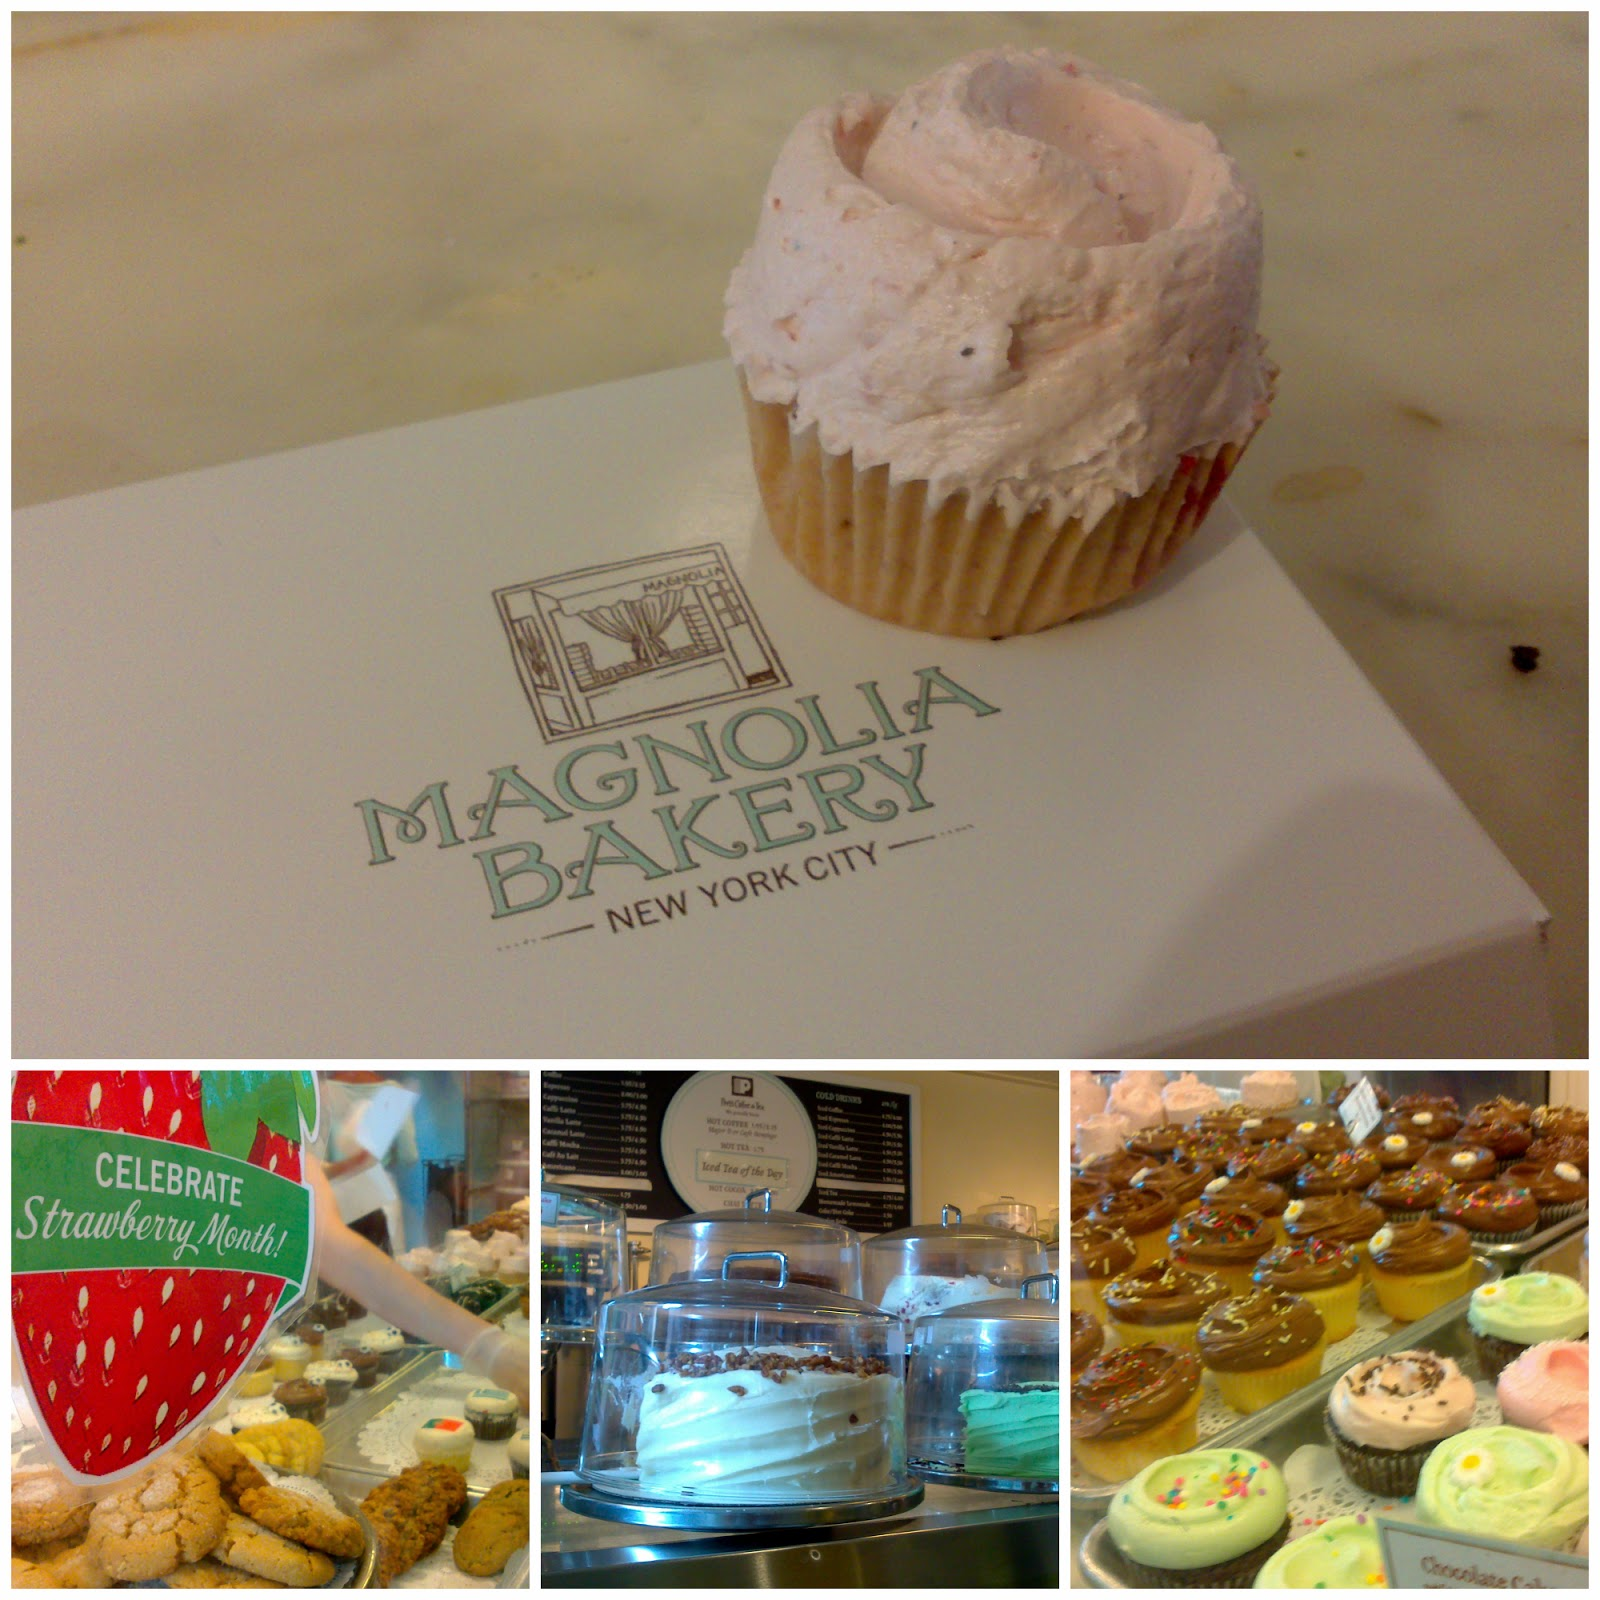 Cookies, tartes i cupcakes de Magnolia Bakery